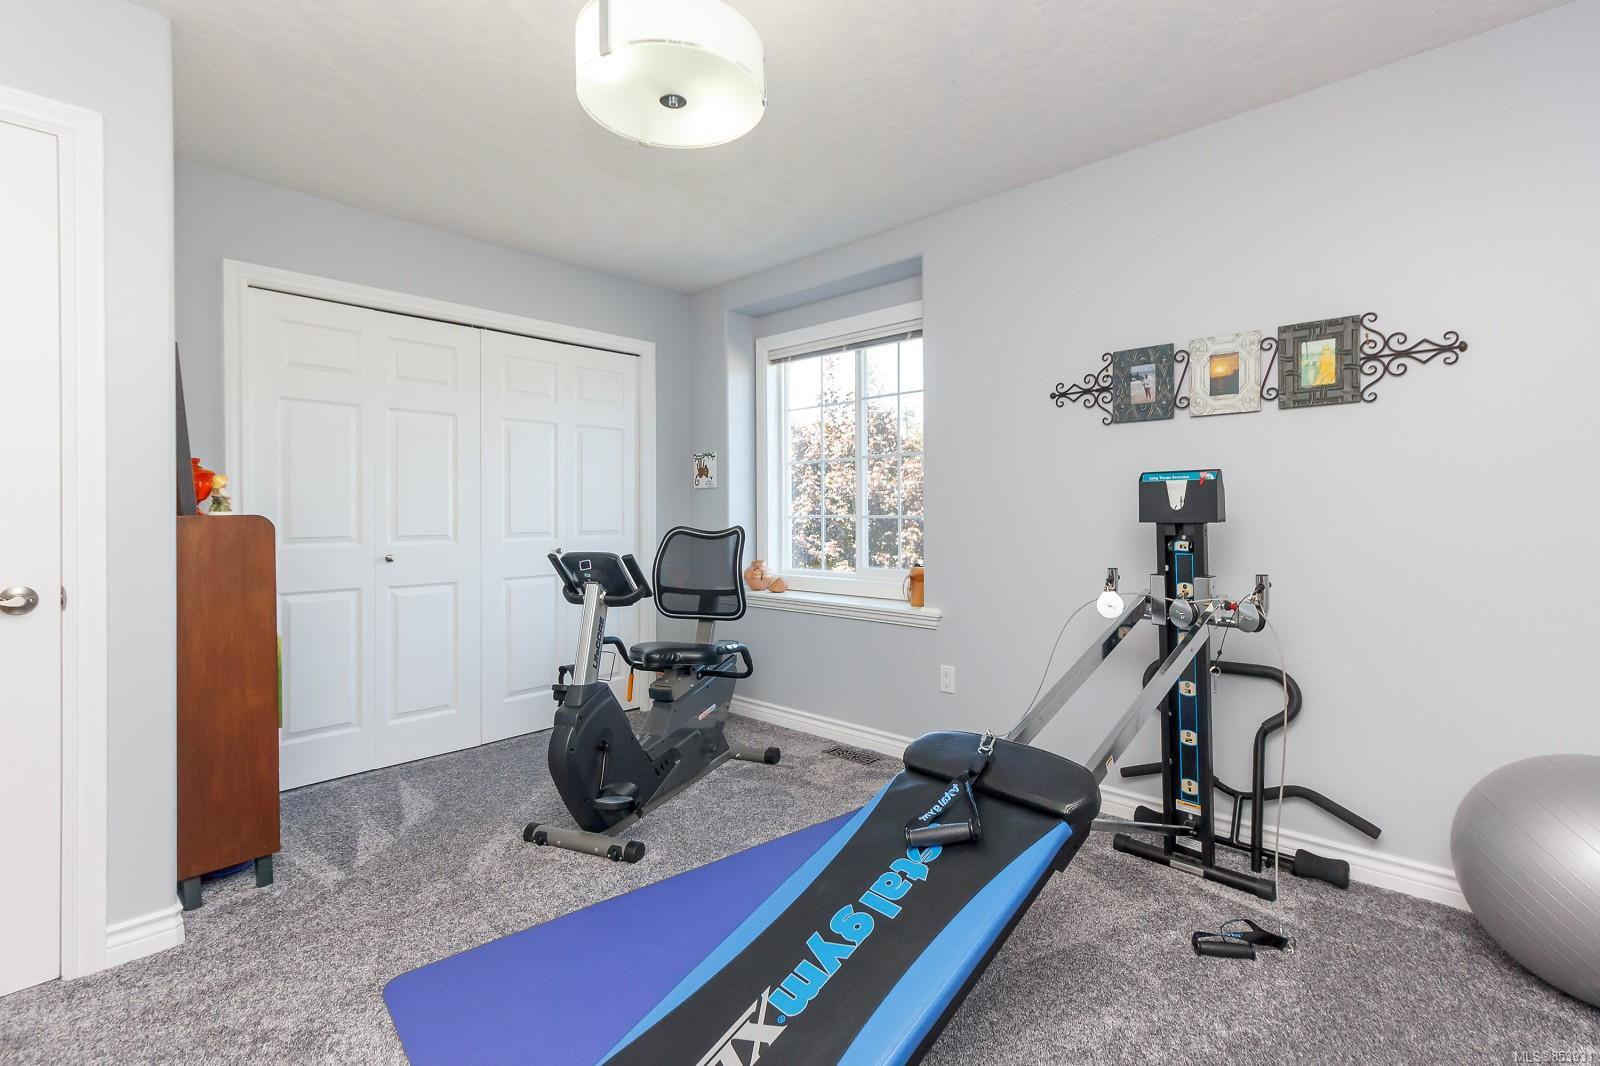 Photo 17: Photos: 2456 Timbercrest Dr in : Du East Duncan House for sale (Duncan)  : MLS®# 853931